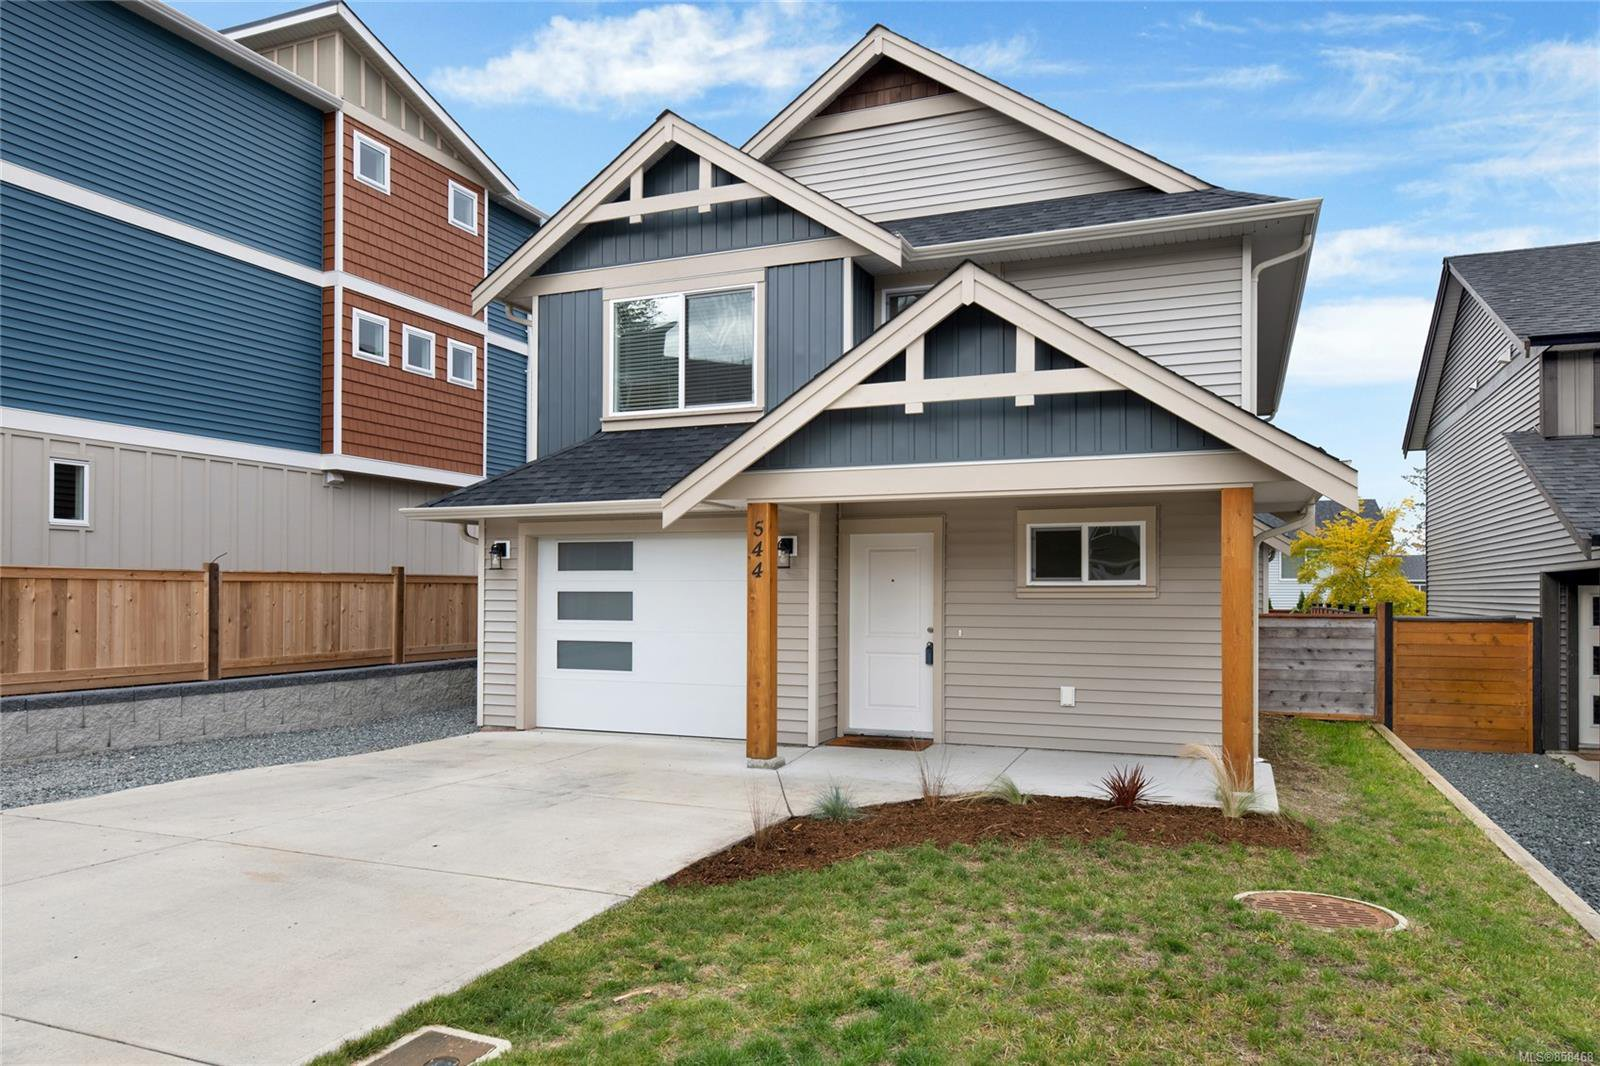 Main Photo: 544 Steeves Rd in : Na South Nanaimo House for sale (Nanaimo)  : MLS®# 858468